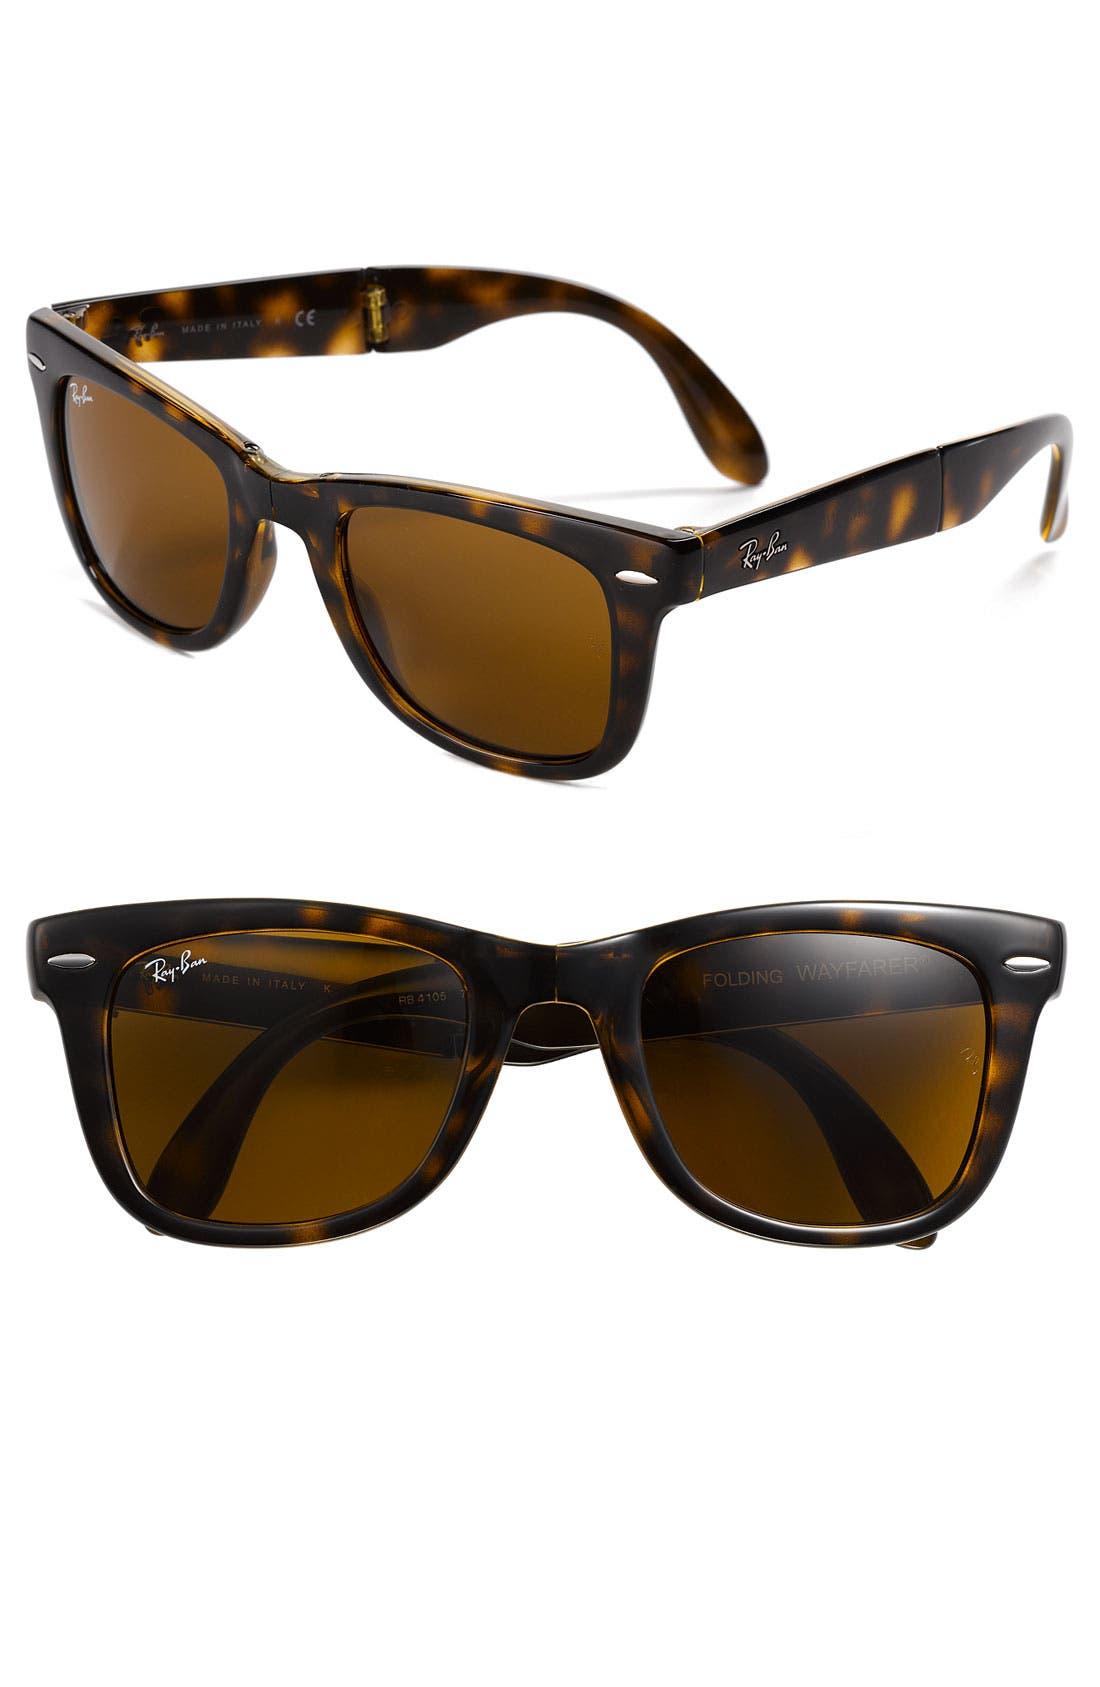 Main Image - Ray-Ban 'Folding Wayfarer' 50mm Sunglasses